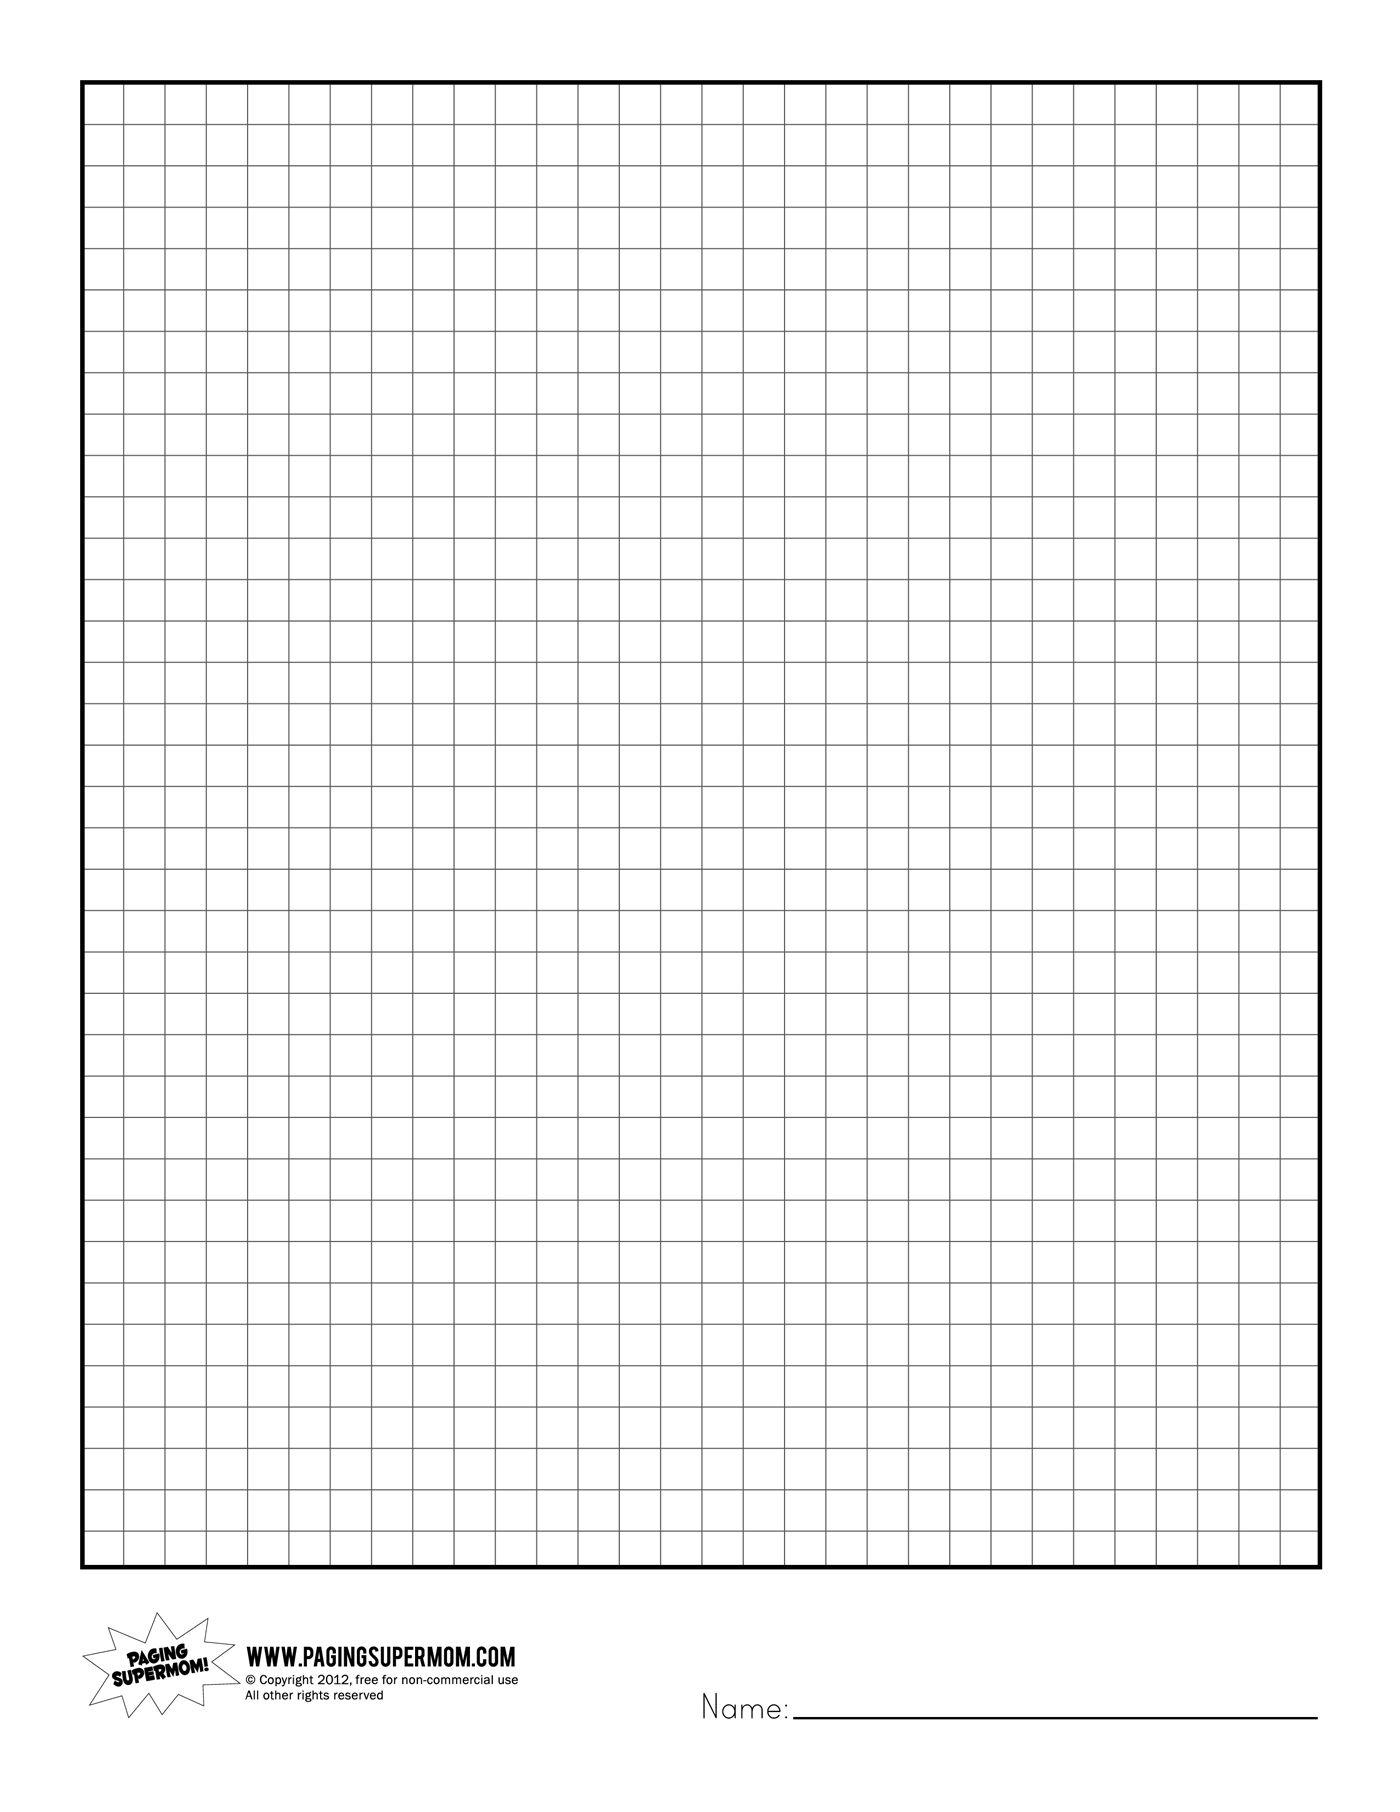 Printable Graph Paper | Healthy Eating | Printable Graph Paper - Free Printable Graph Paper For Elementary Students